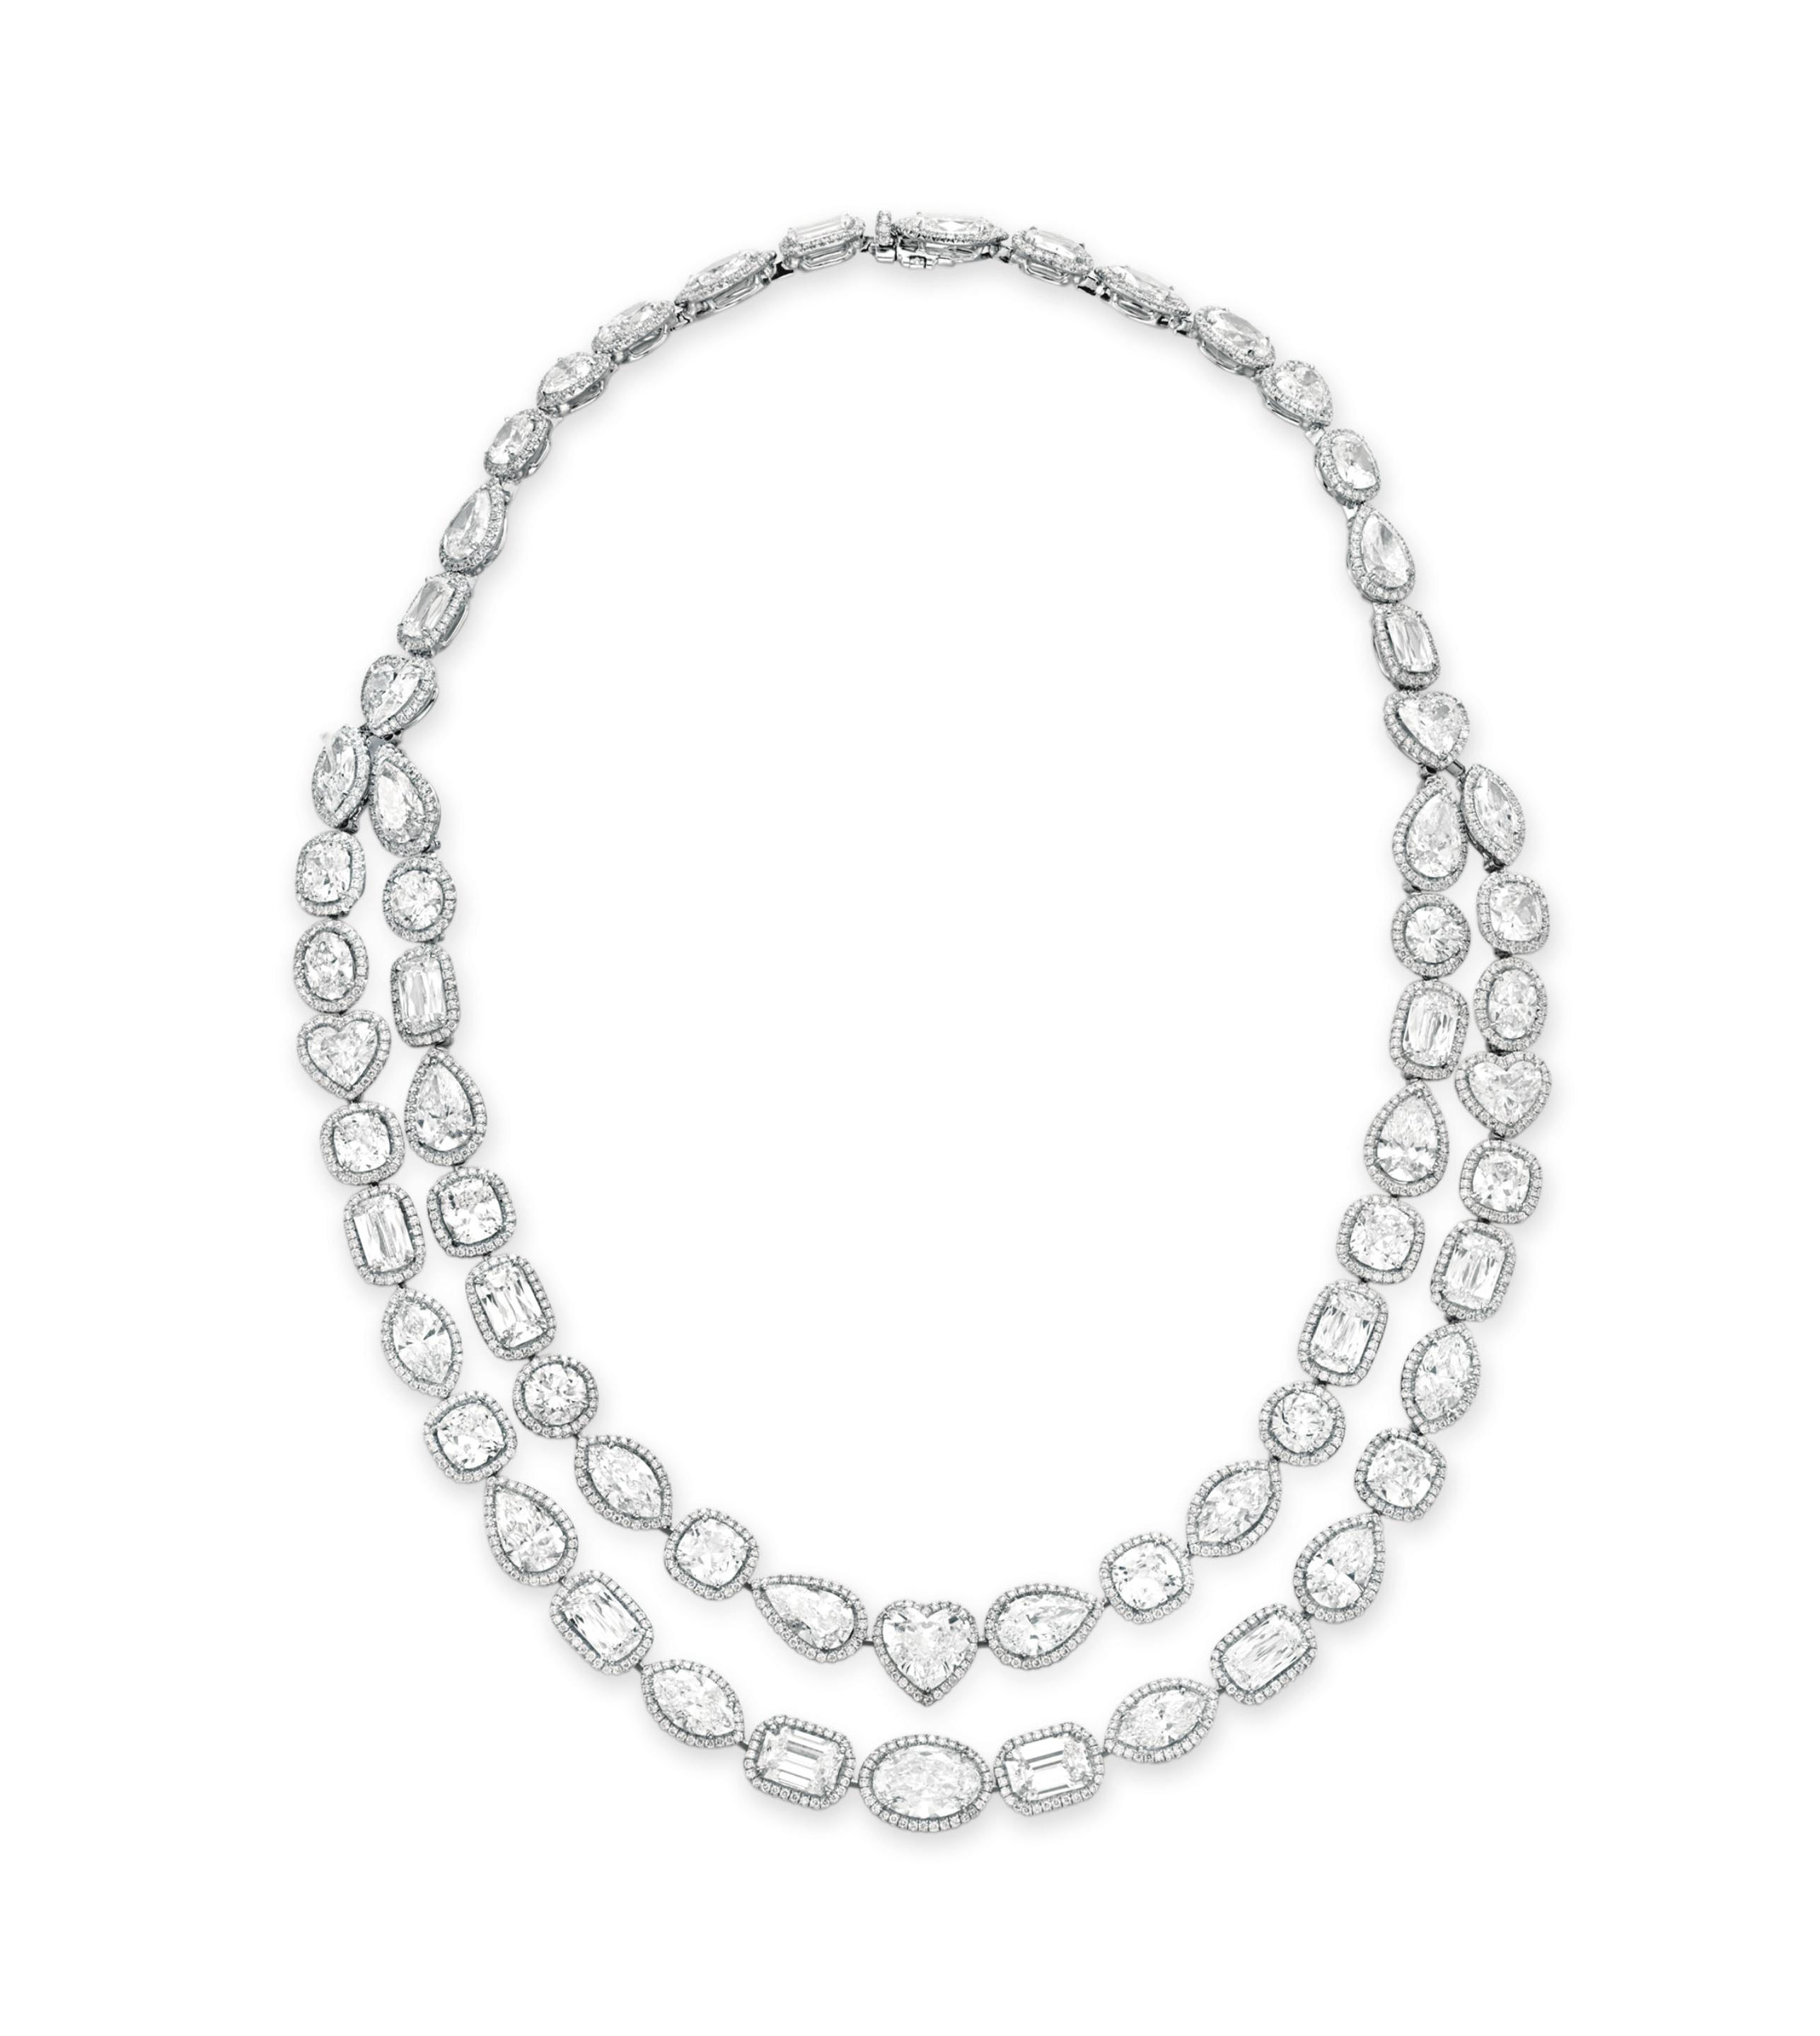 A DIAMOND NECKLACE, BY WILLIAM GOLDBERG